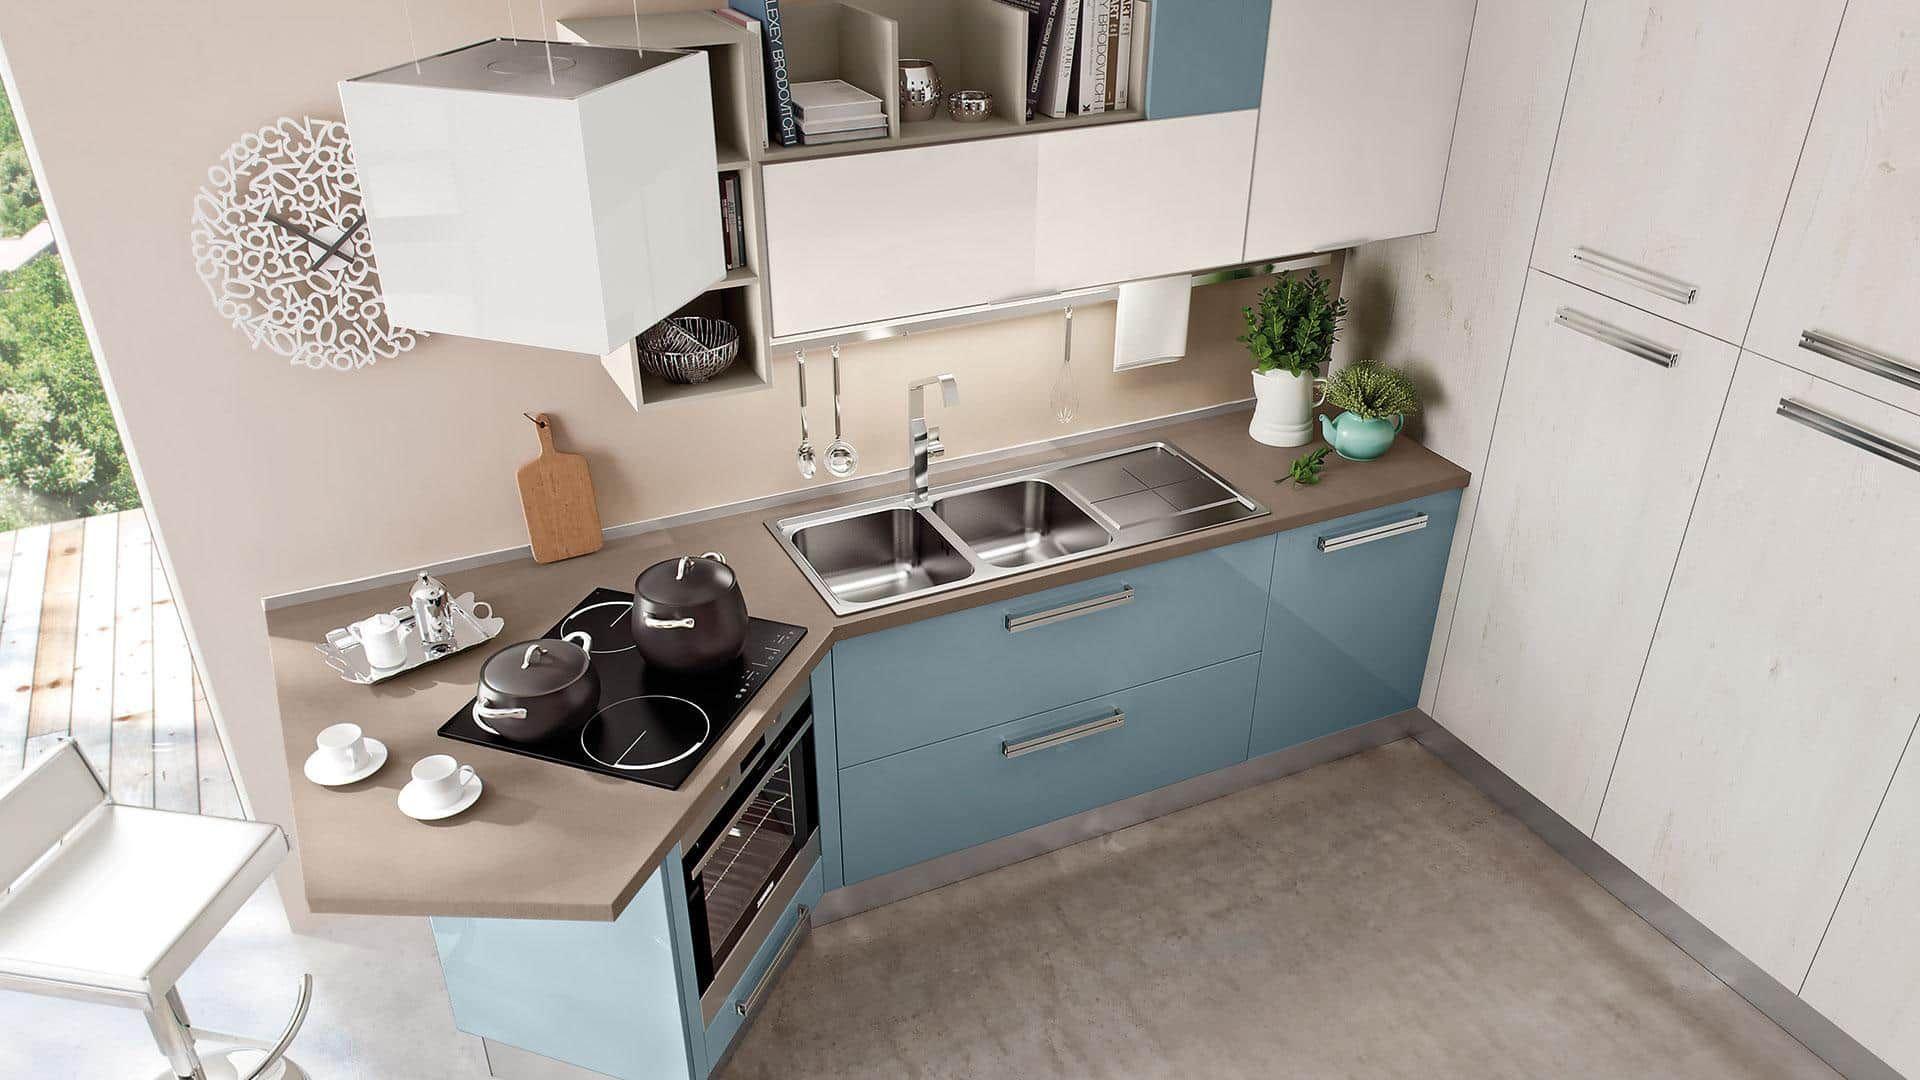 Arredamento rosticceria ~ Arredamento per cucine di piccole dimensioni arredo cucine